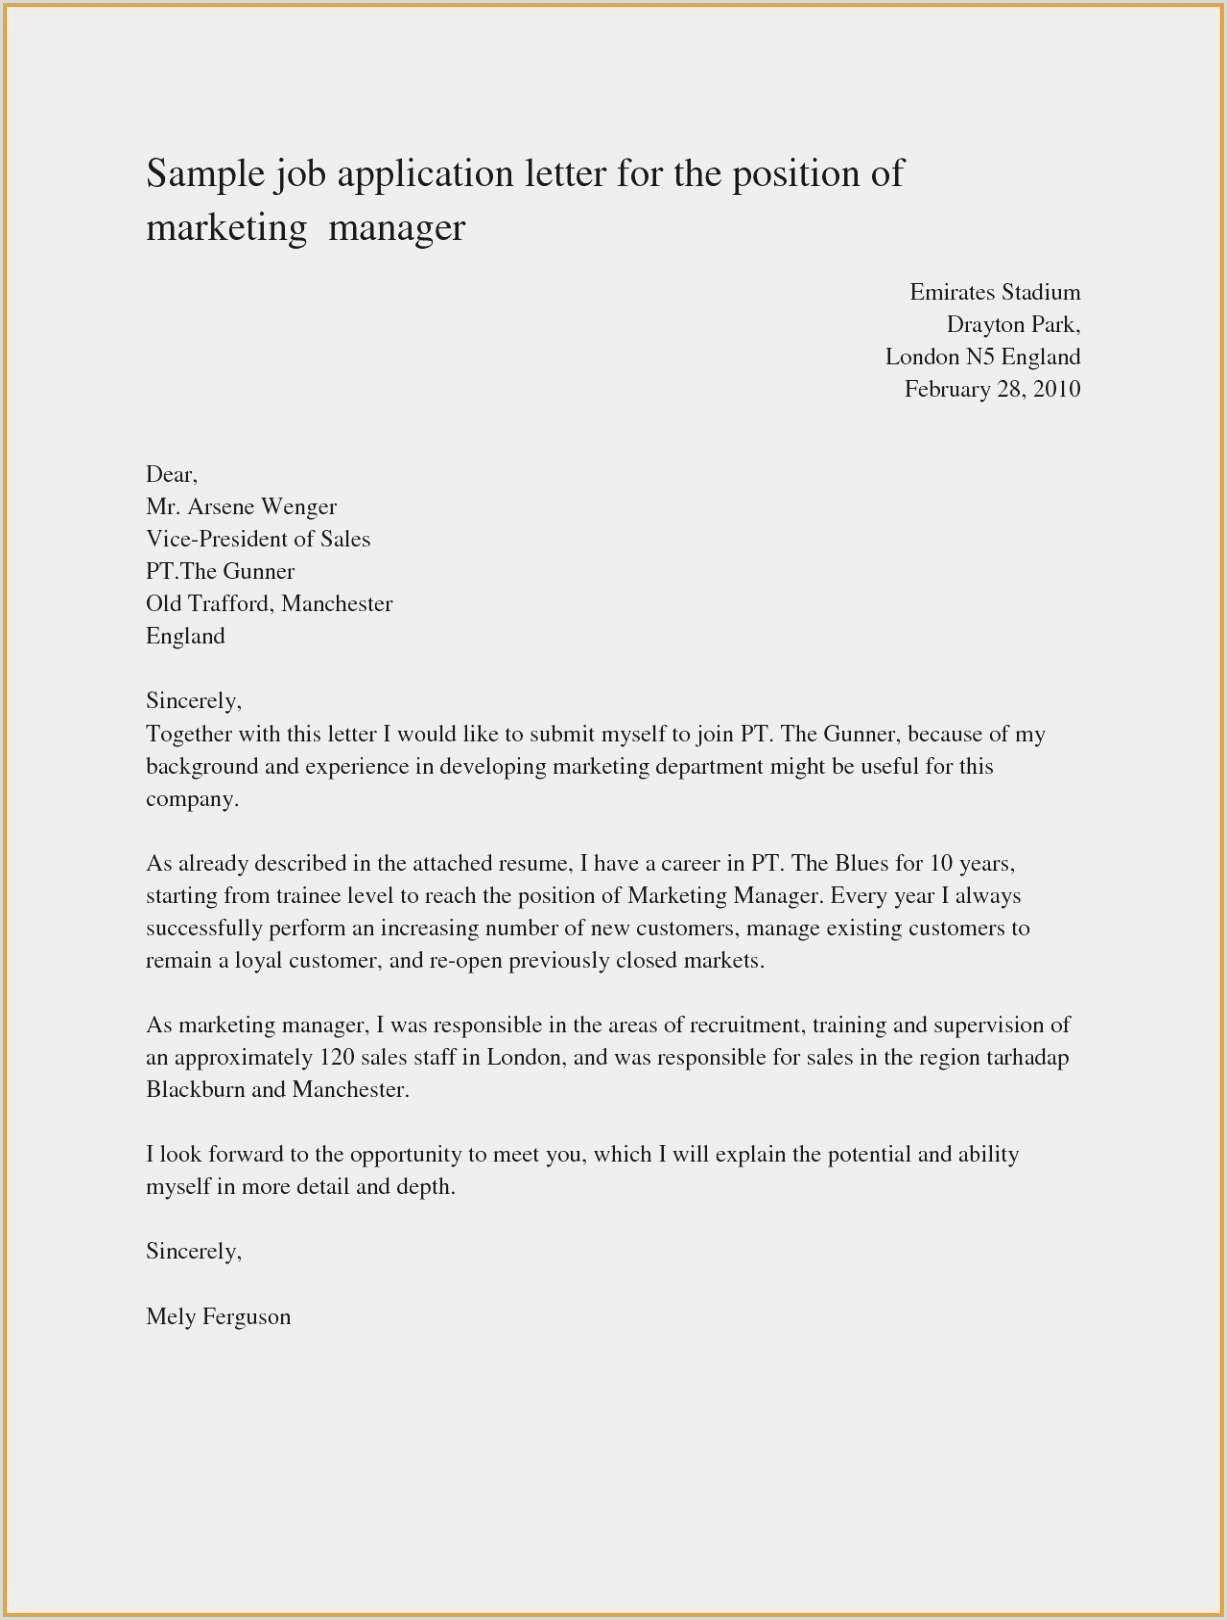 The Standard Cv format   Application letters, Job cover letter ...